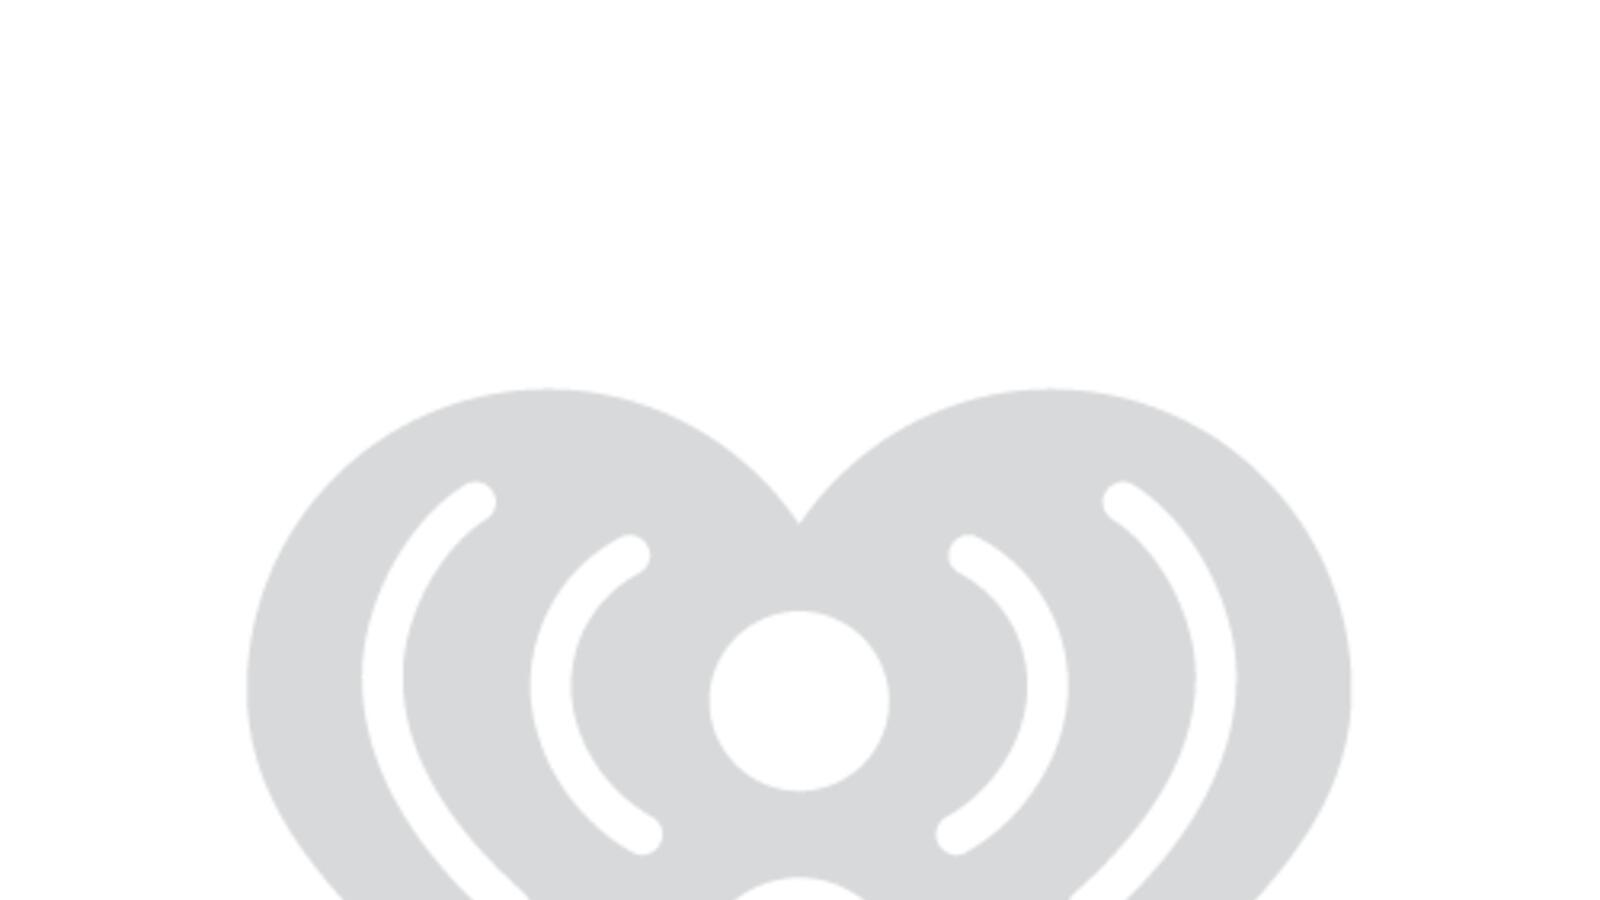 Benton County Iowa Sheriff investigating rural arson cases